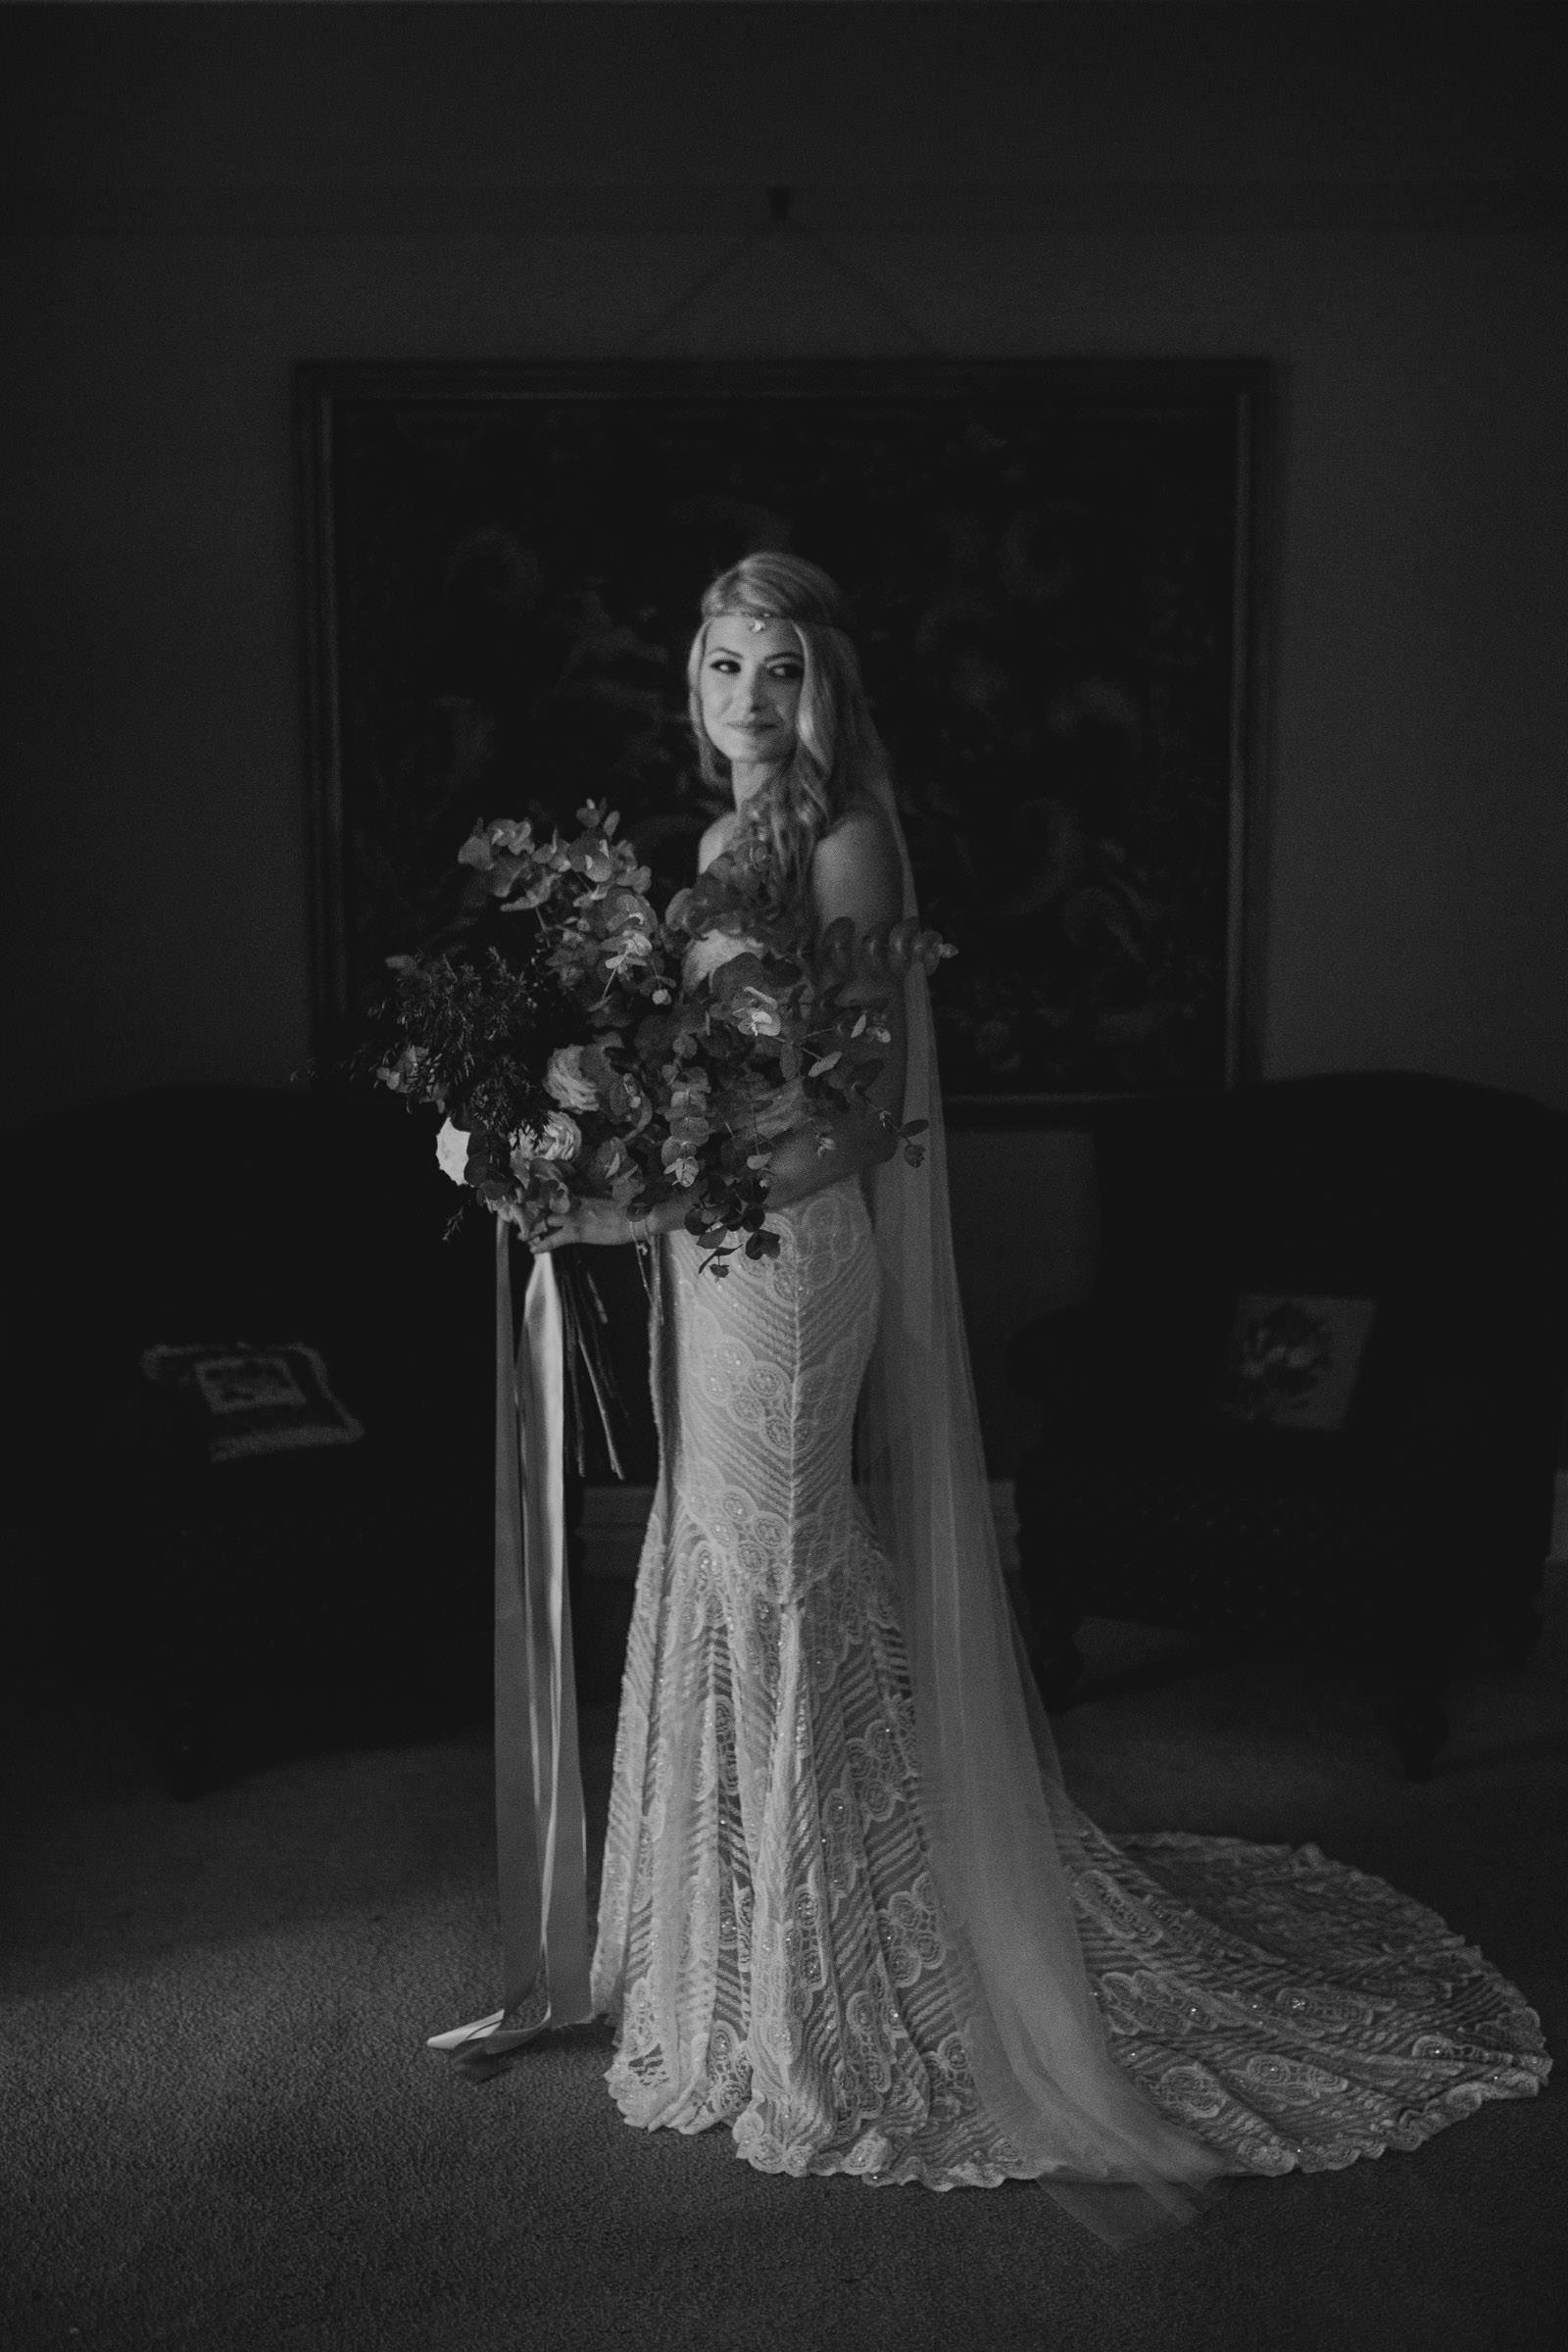 Emma+John+Far+South+Coast+Wedding+Festivl+Glamping+Bush-52.jpg